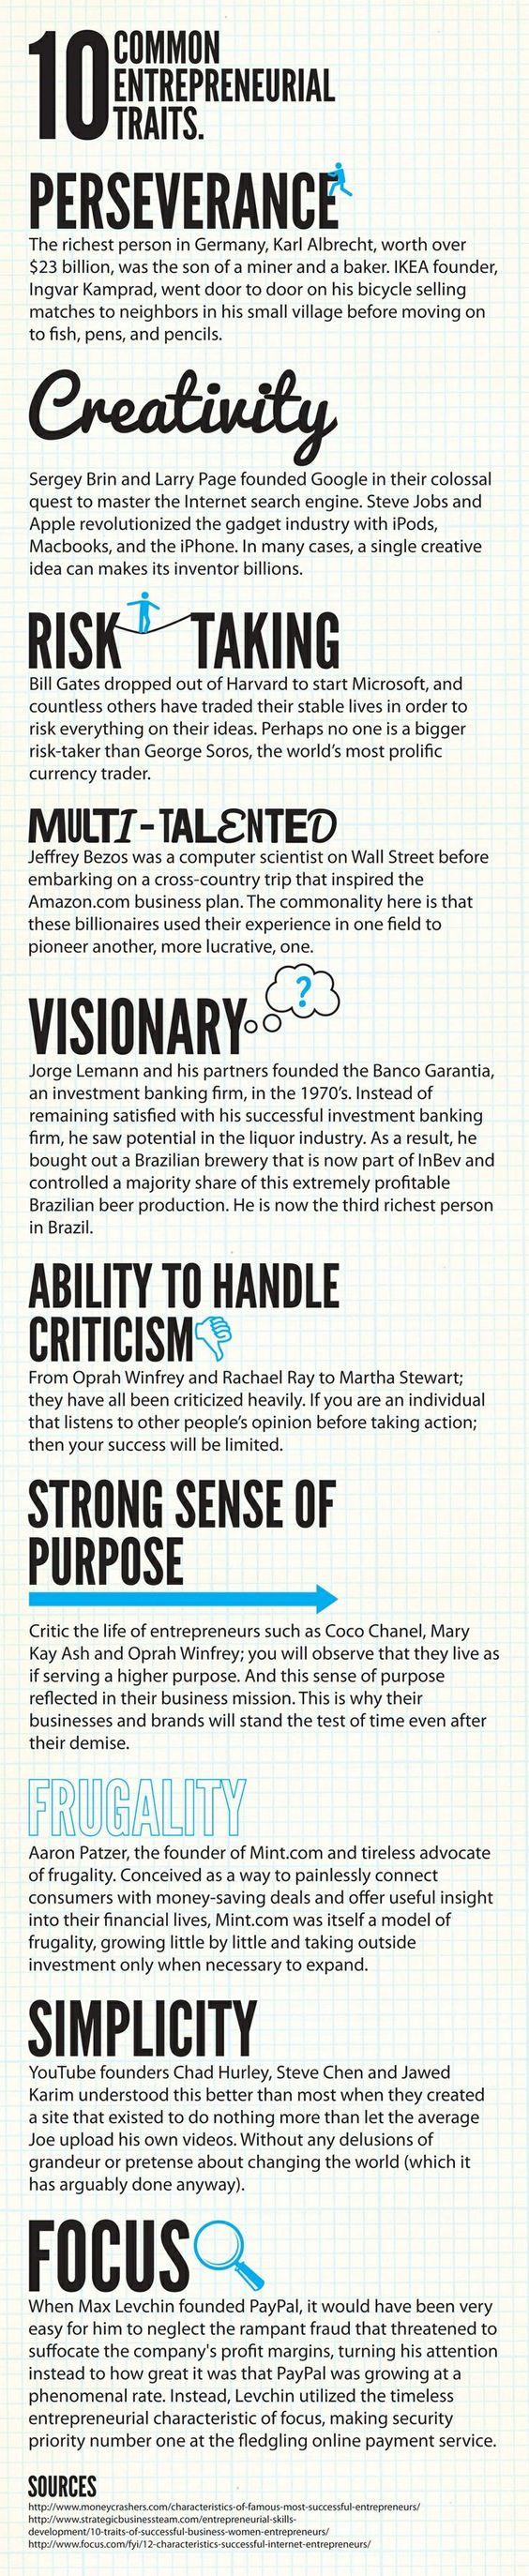 10 common #entrepreneurial traits. Good examples of #entrepreneurs for each #trait. www.econiconline.com (scheduled via http://www.tailwindapp.com?utm_source=pinterest&utm_medium=twpin&utm_content=post30647276&utm_campaign=scheduler_attribution)